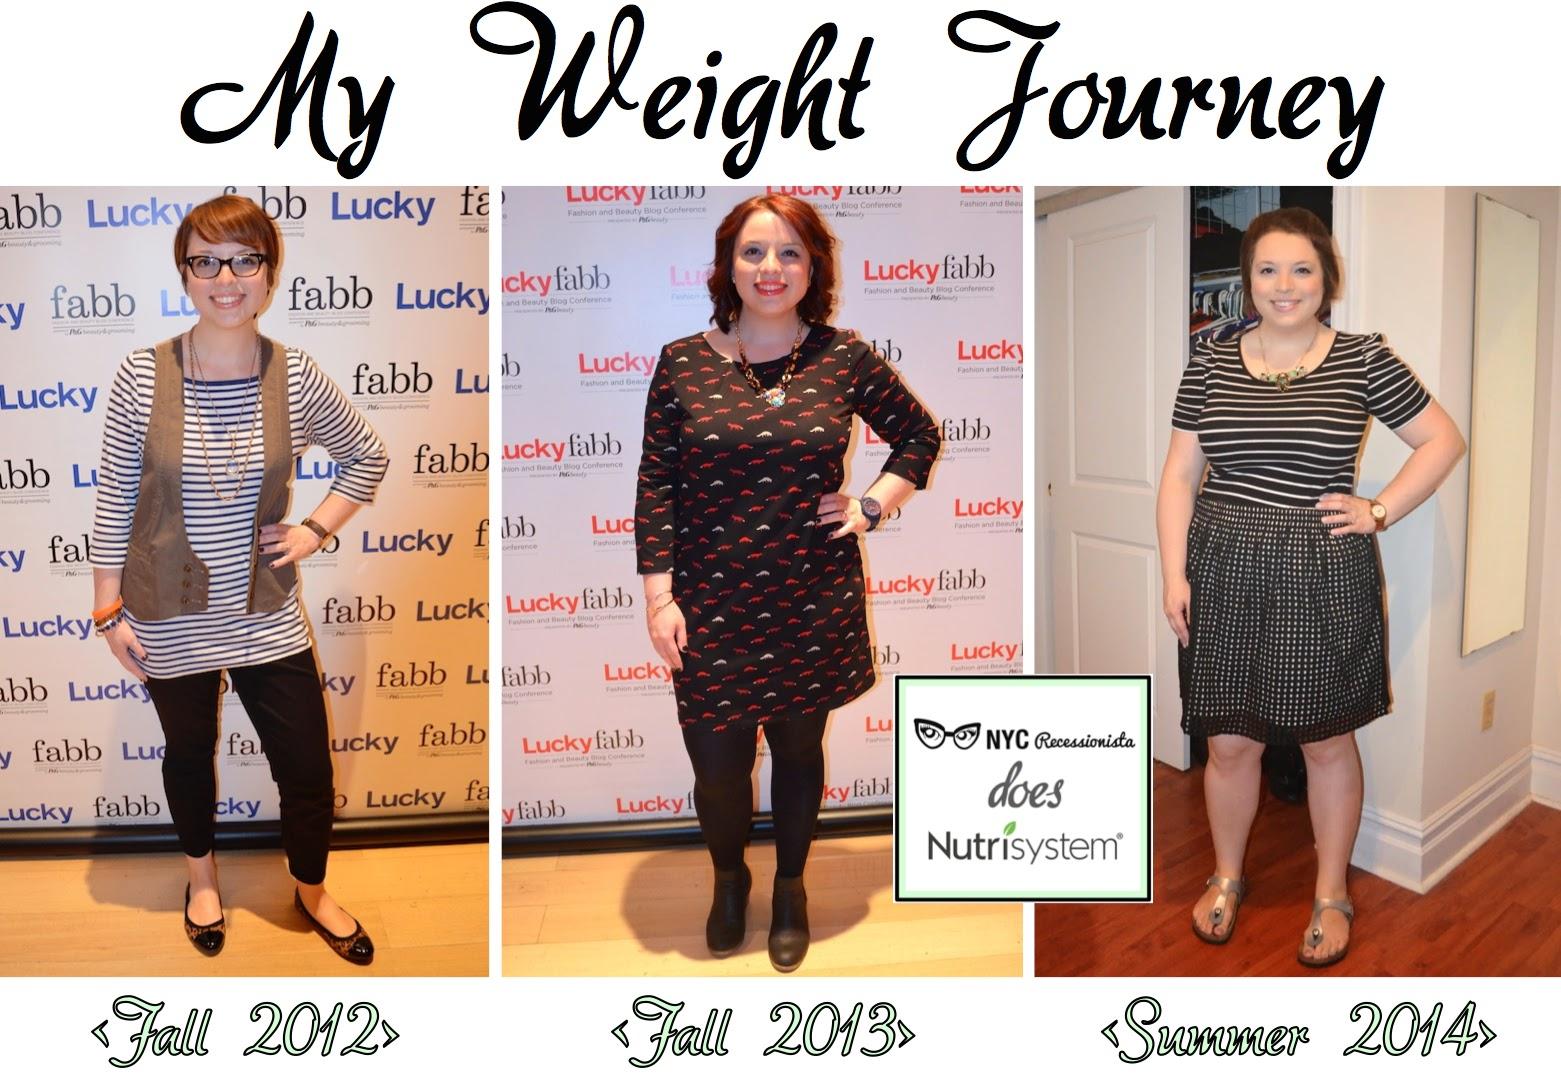 Lose weight glucomannan photo 1